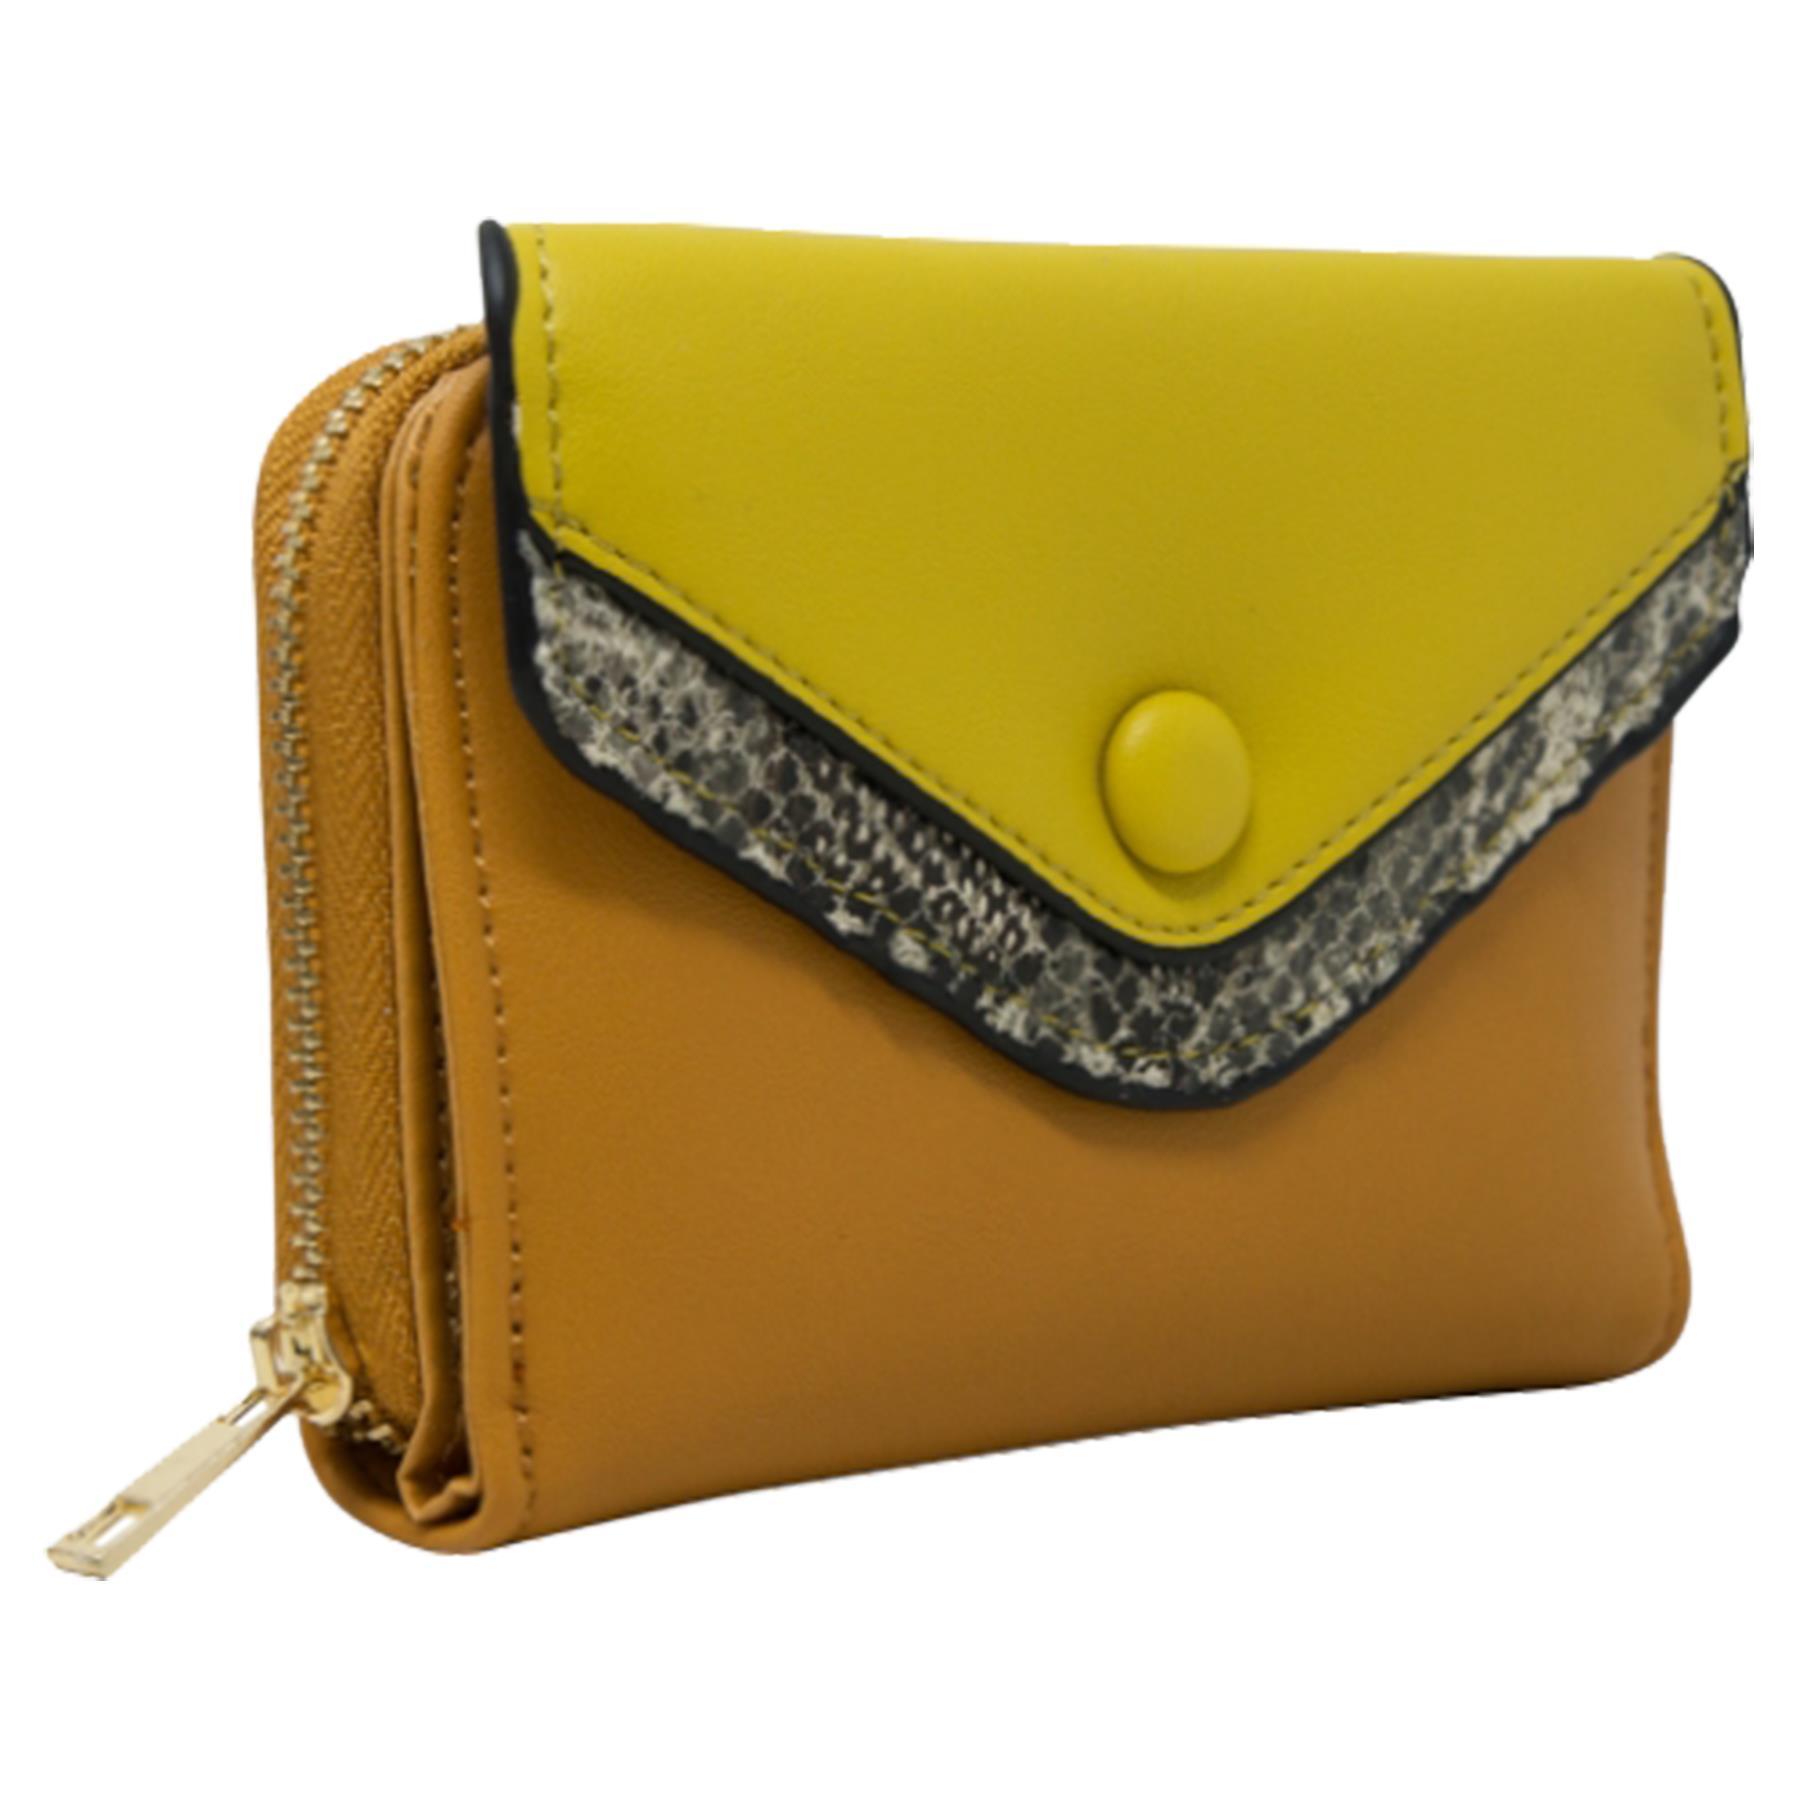 New-Ladies-Multicoloured-Envelope-Faux-Leather-Reptile-Detail-Purse thumbnail 15